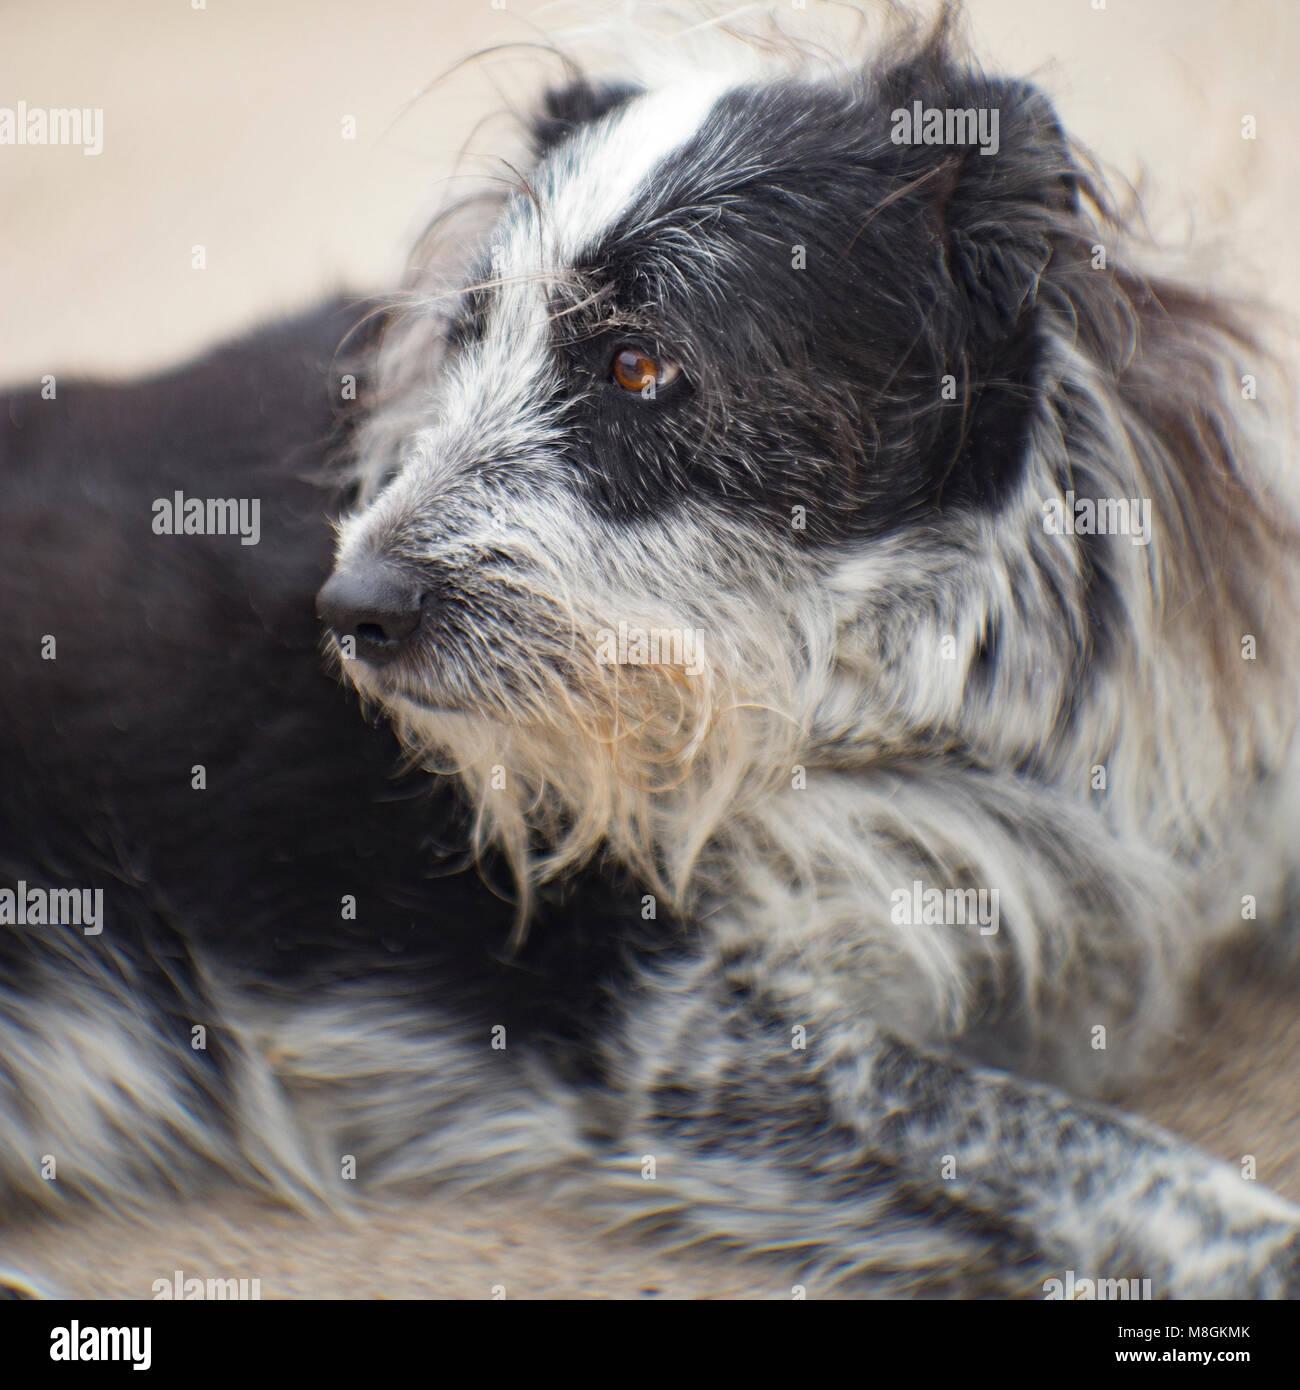 Grey Shaggy Dog Stock Photos & Grey Shaggy Dog Stock Images - Alamy